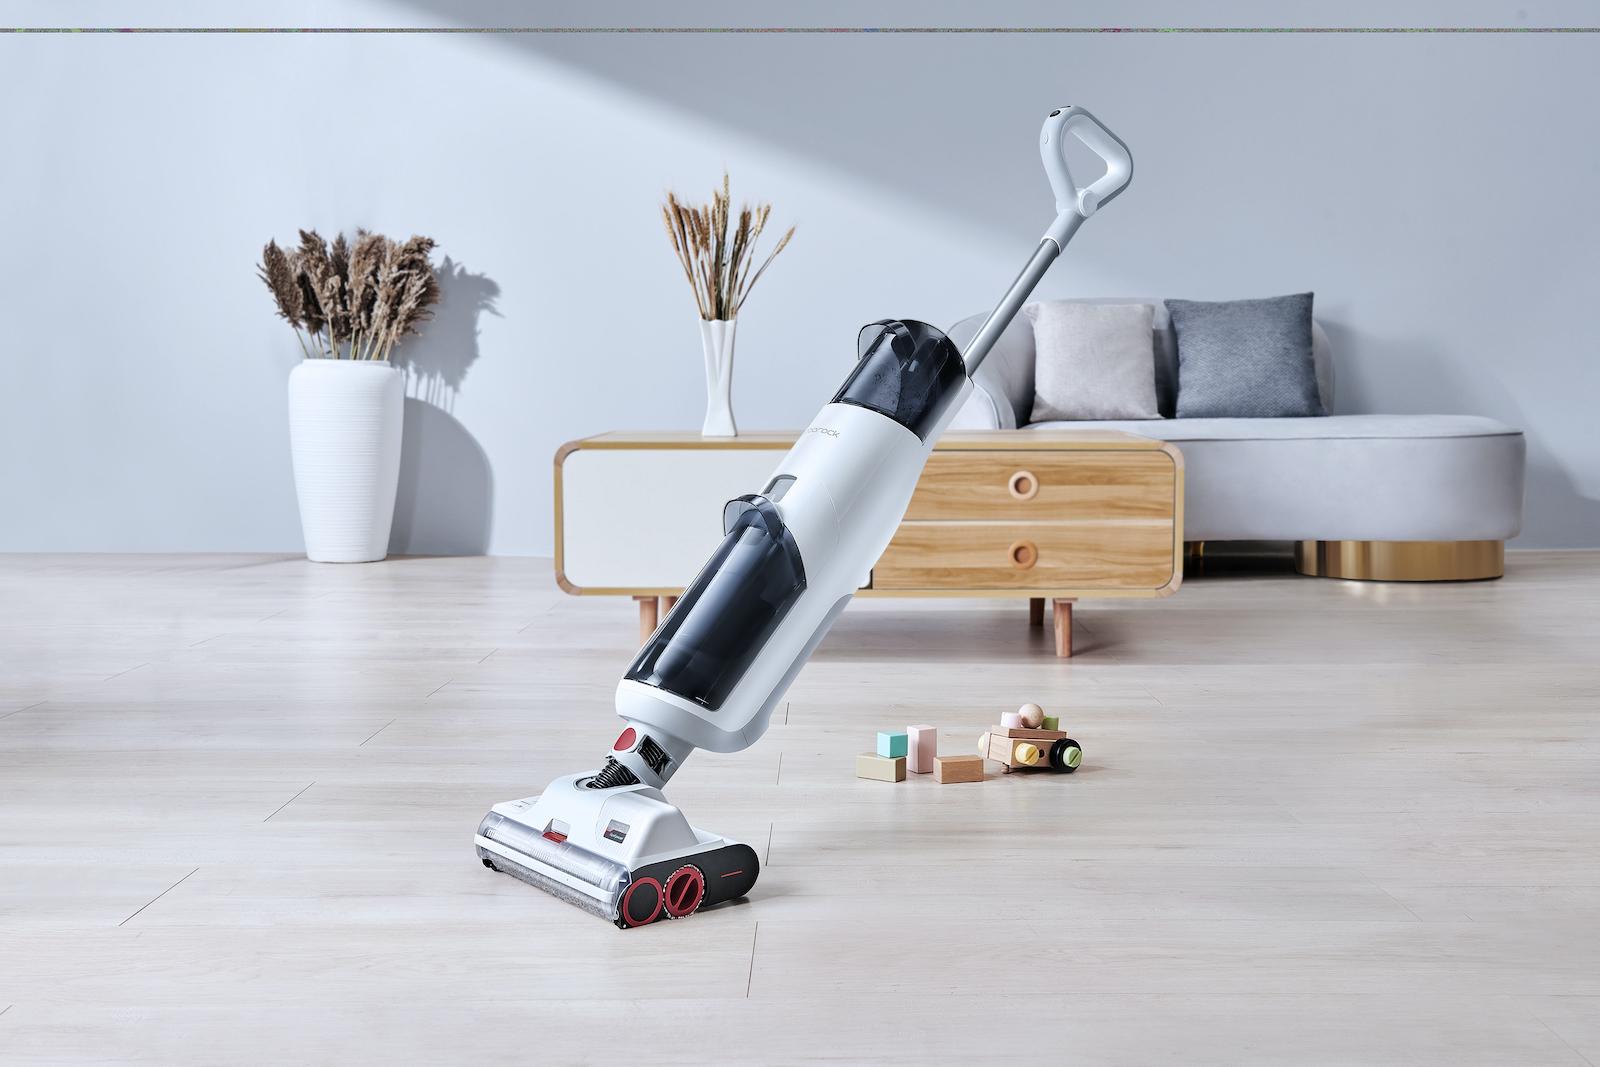 Roborock U10 Mopping Vacuum